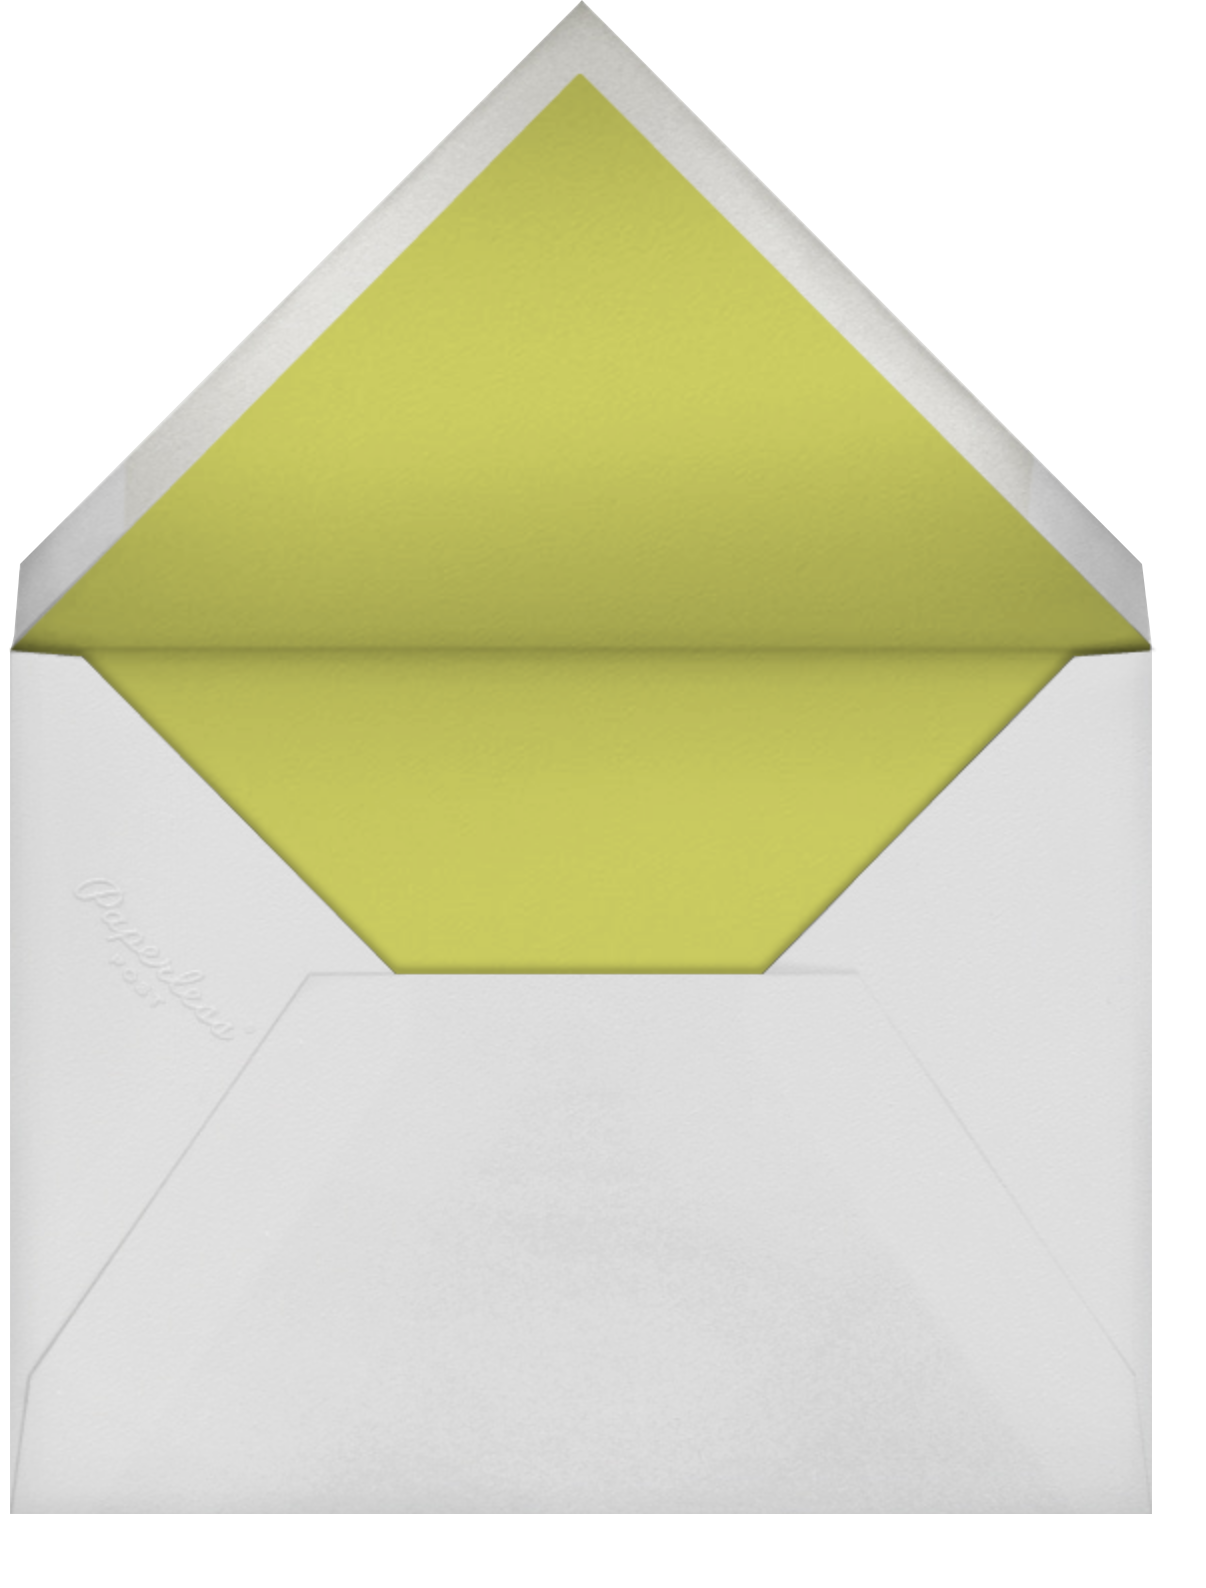 Veda - Green Gold Olive - Paperless Post - Envelope